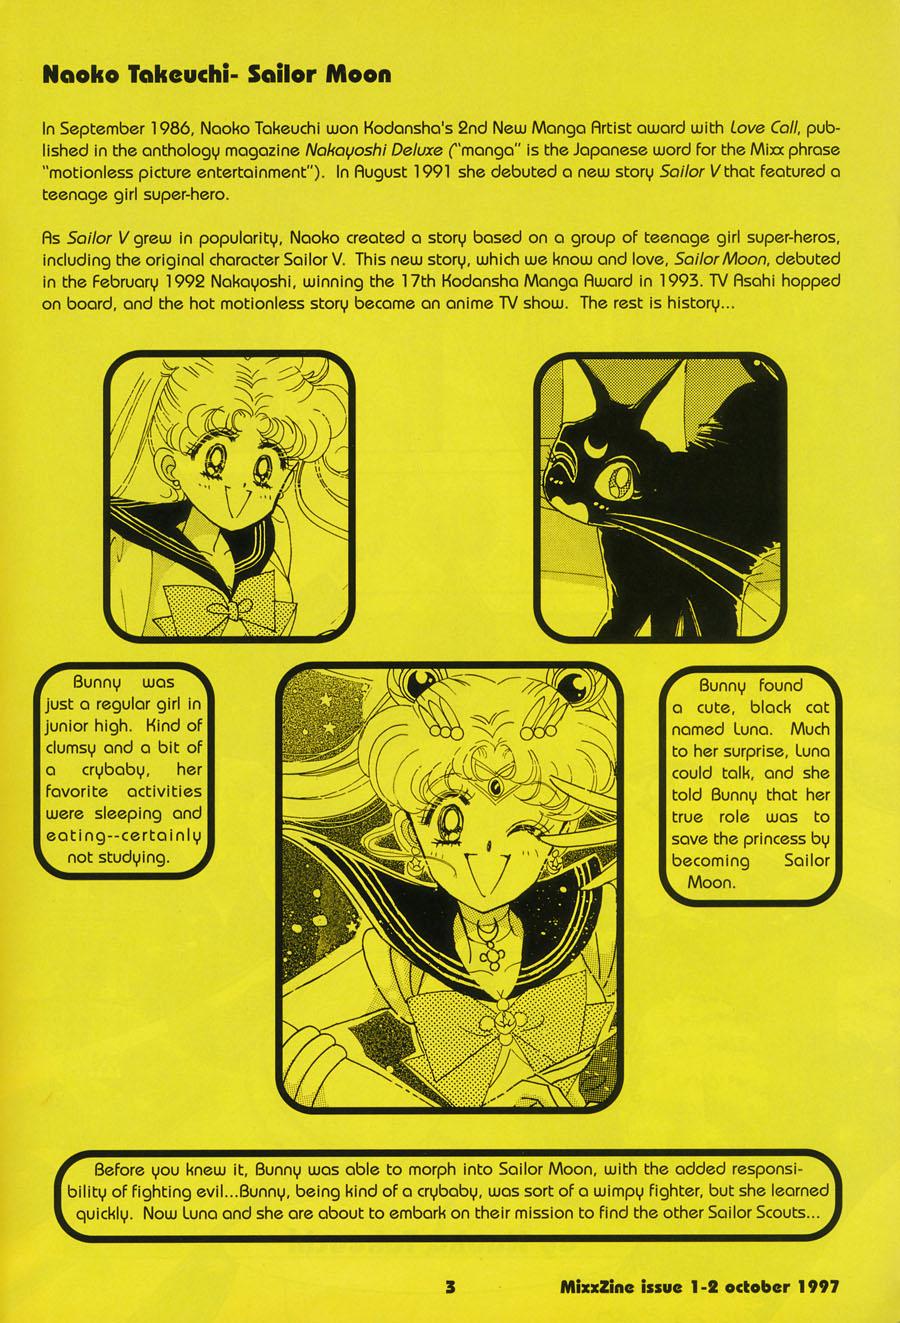 Mixx-Zine-Naoko-Takeuchi-Sailor-Moon-Summary-October-1997-Issue-2